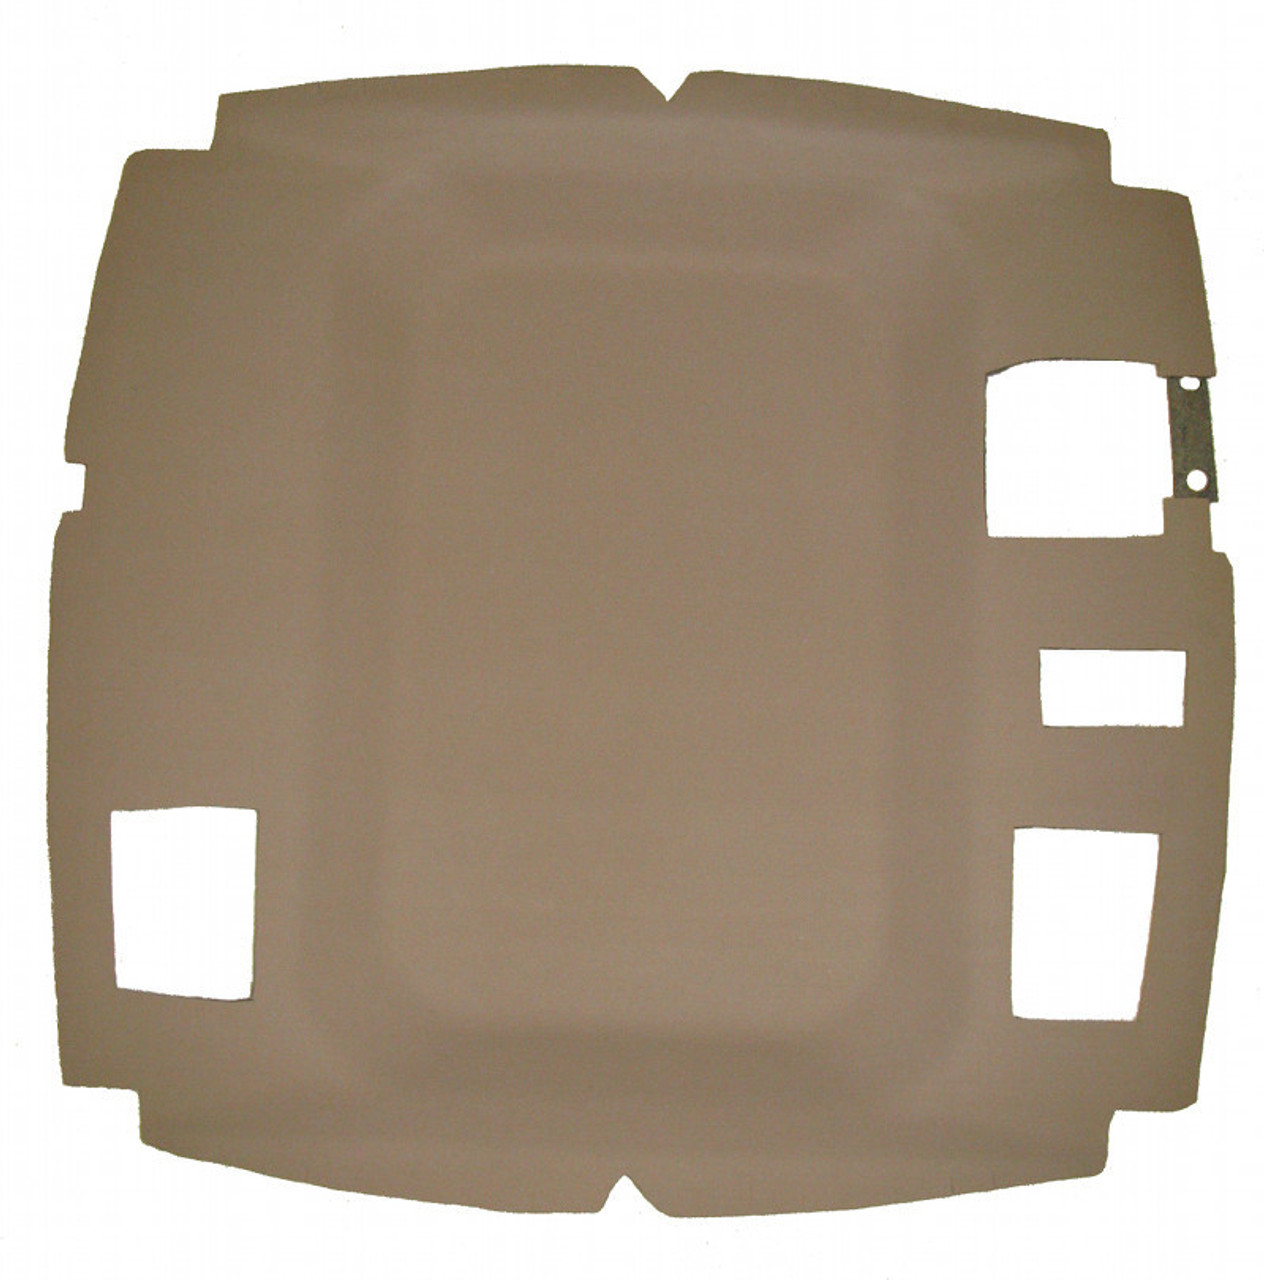 hight resolution of  5420 headliner for john deere 6000 series tractor interior upholstery on john deere 6420 wiring diagram